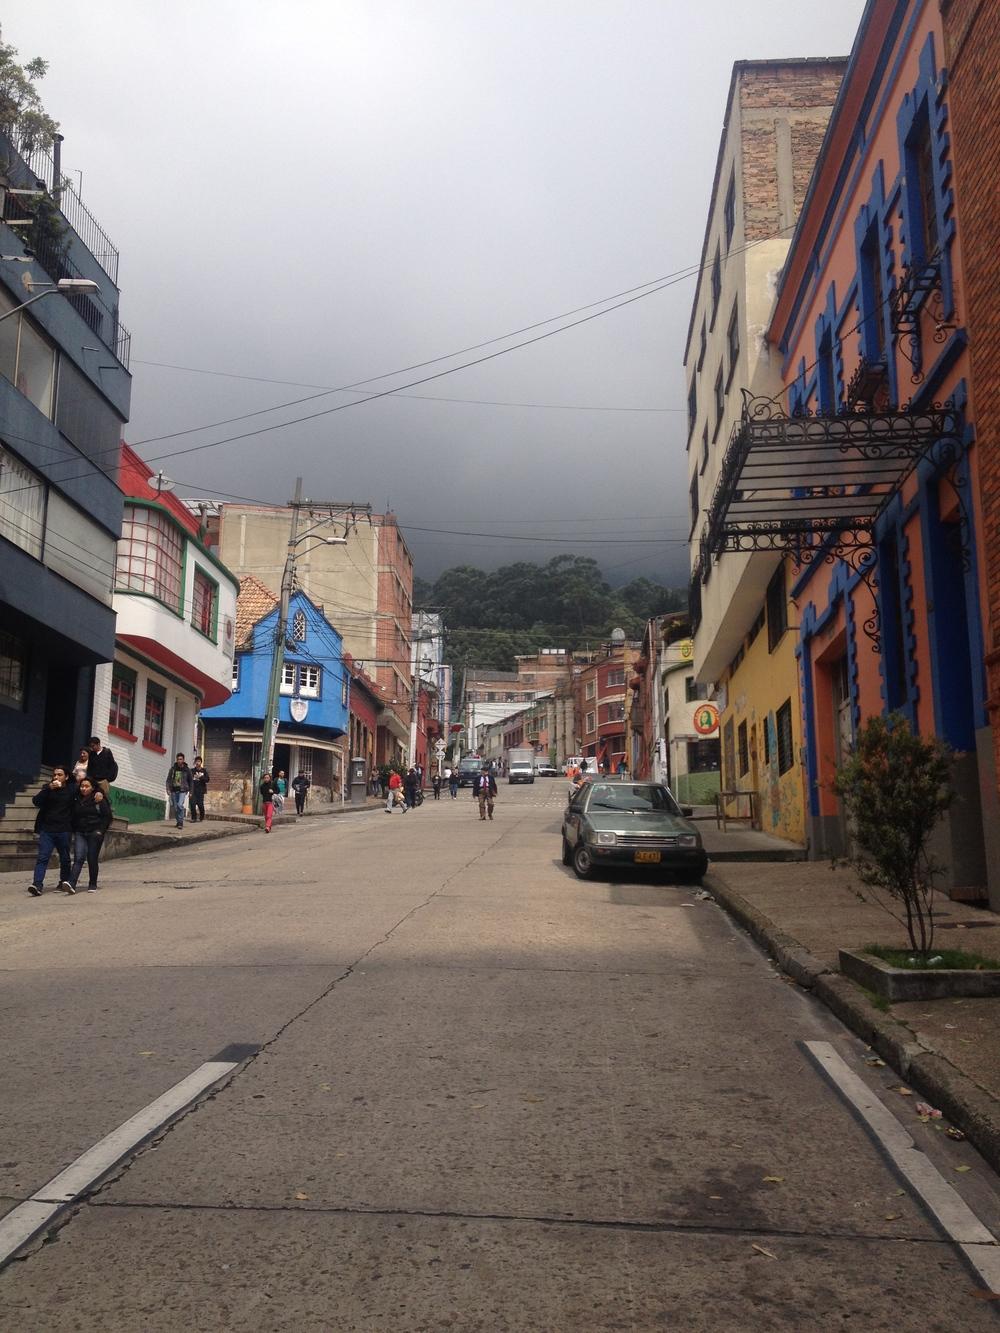 Cloudy day in the Macarena neighborhood